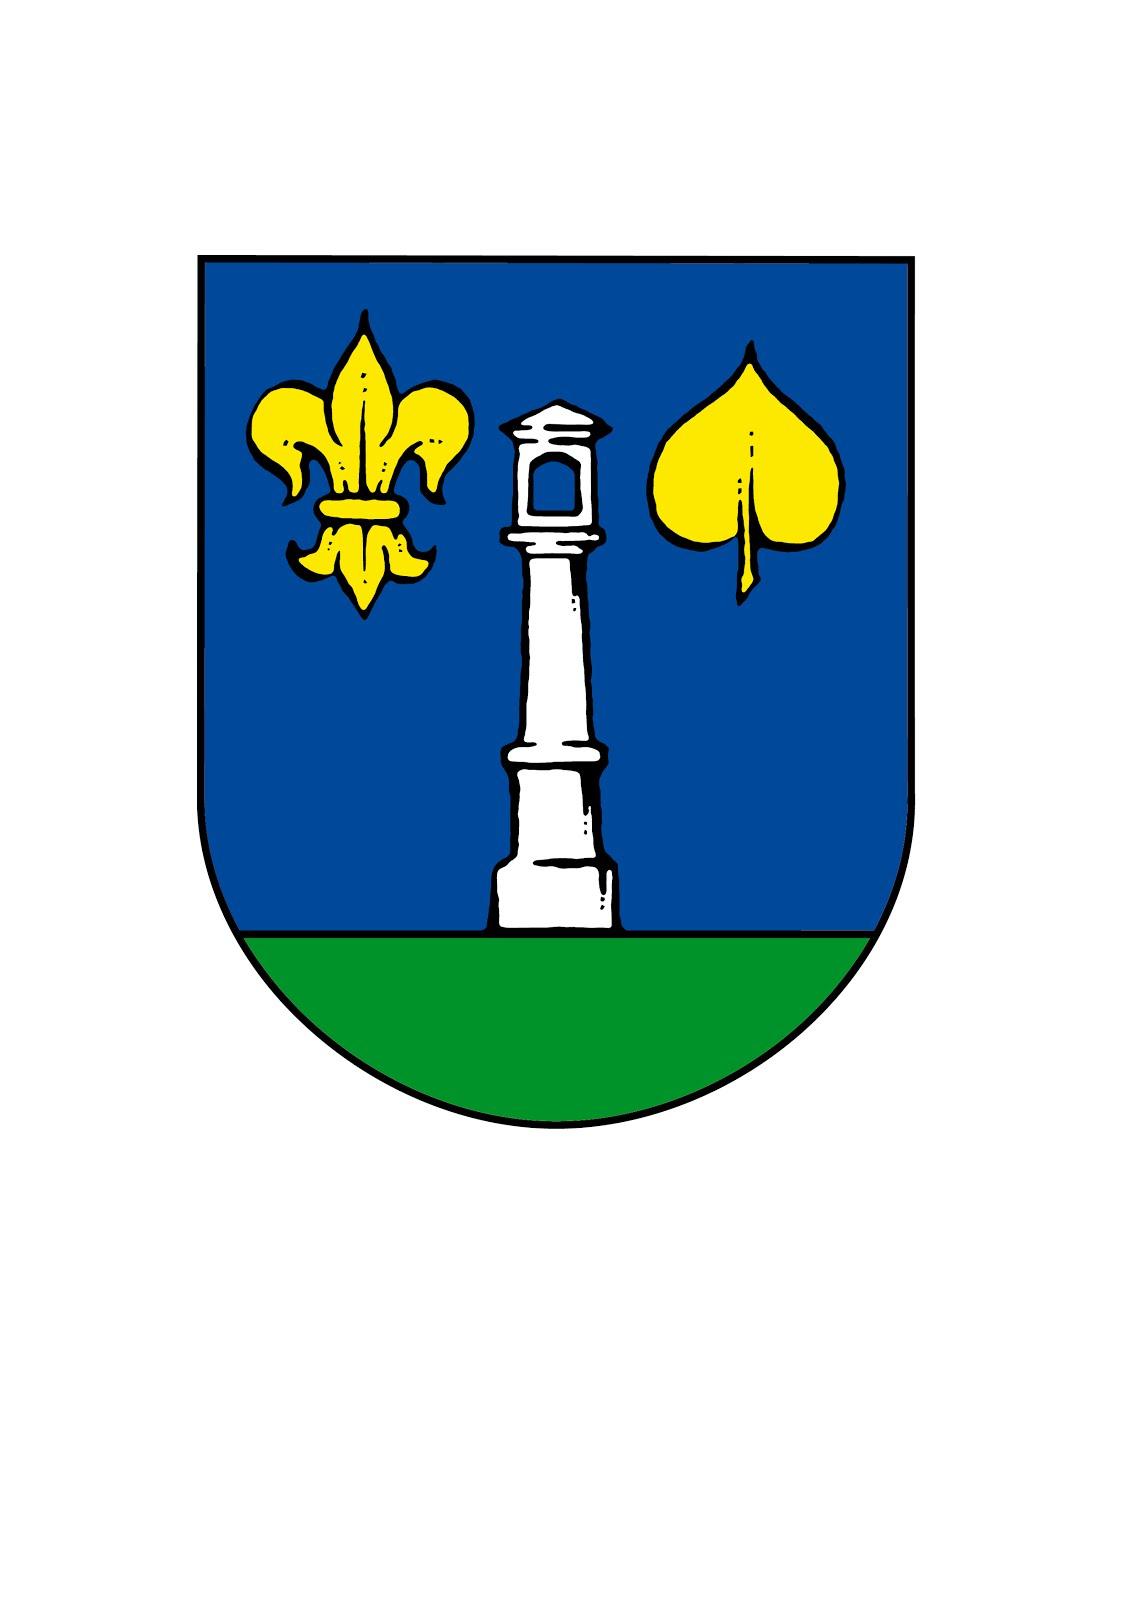 Obci Ohrobec